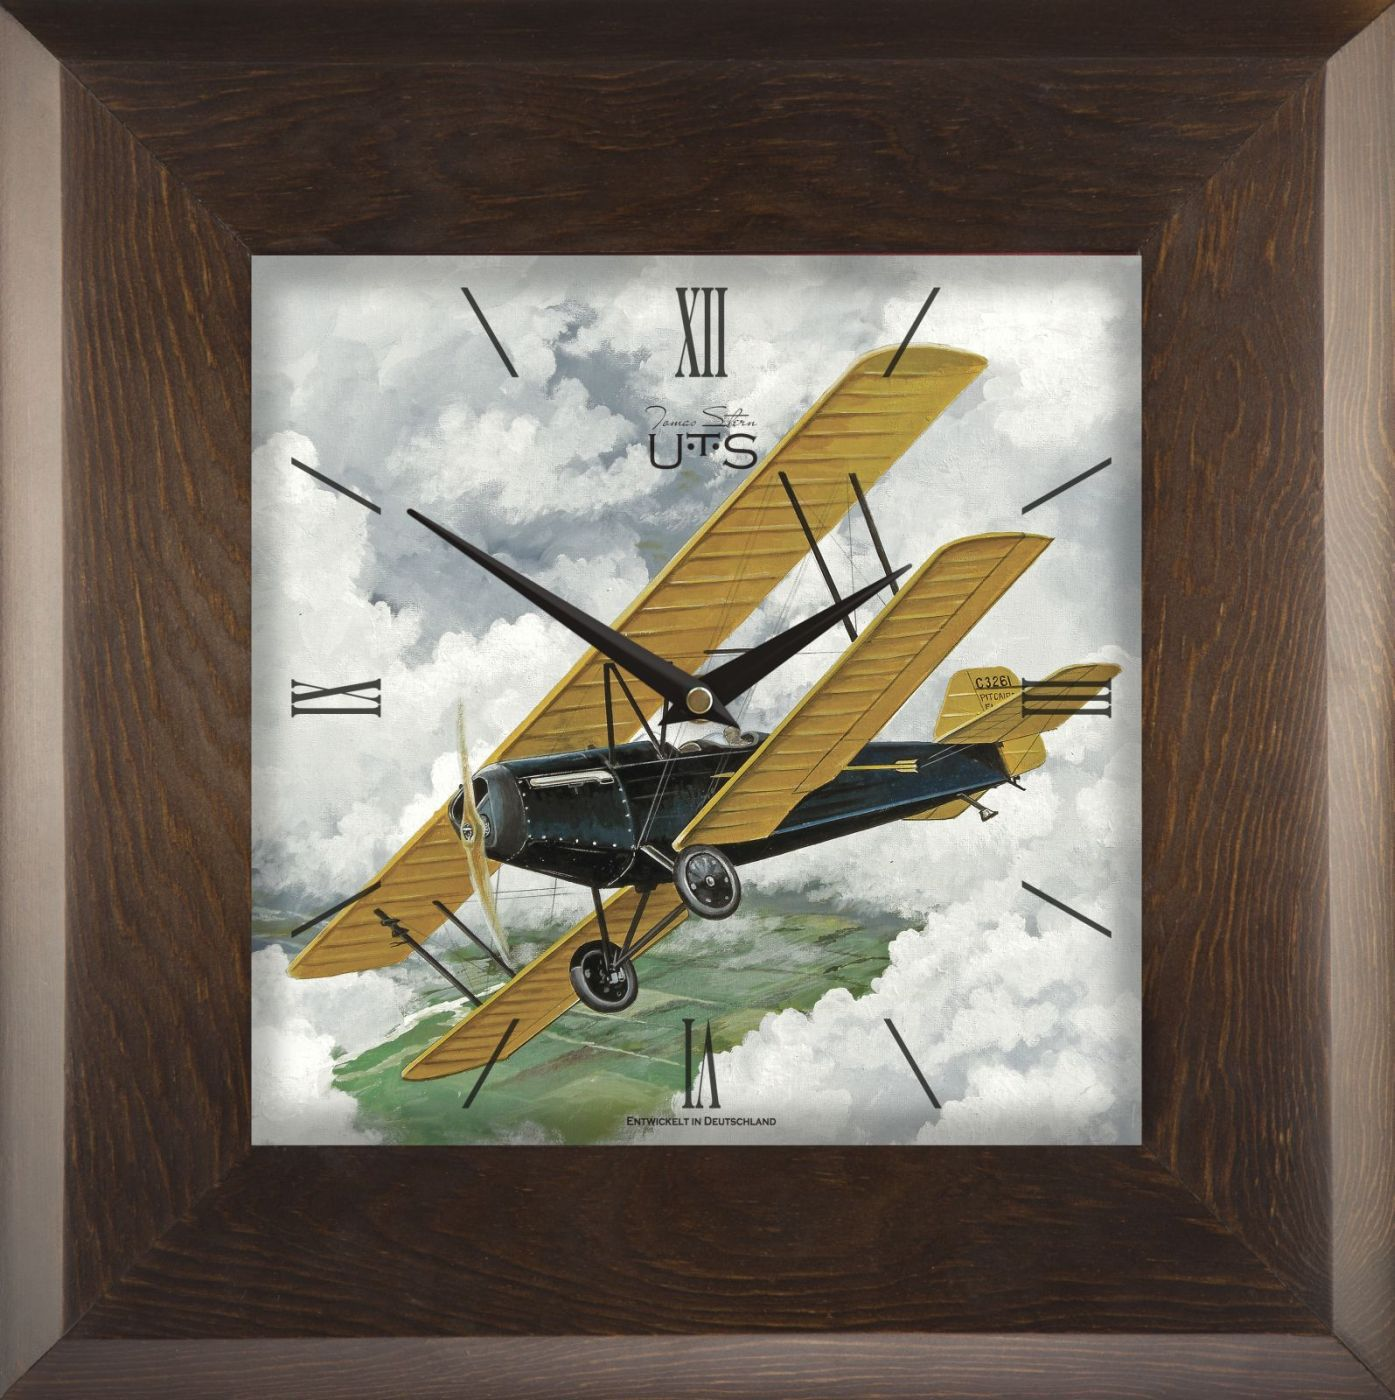 Часы настенные Часы настенные Tomas Stern 7007 chasy-nastennye-tomas-stern-7007-germaniya-tayvan.jpg